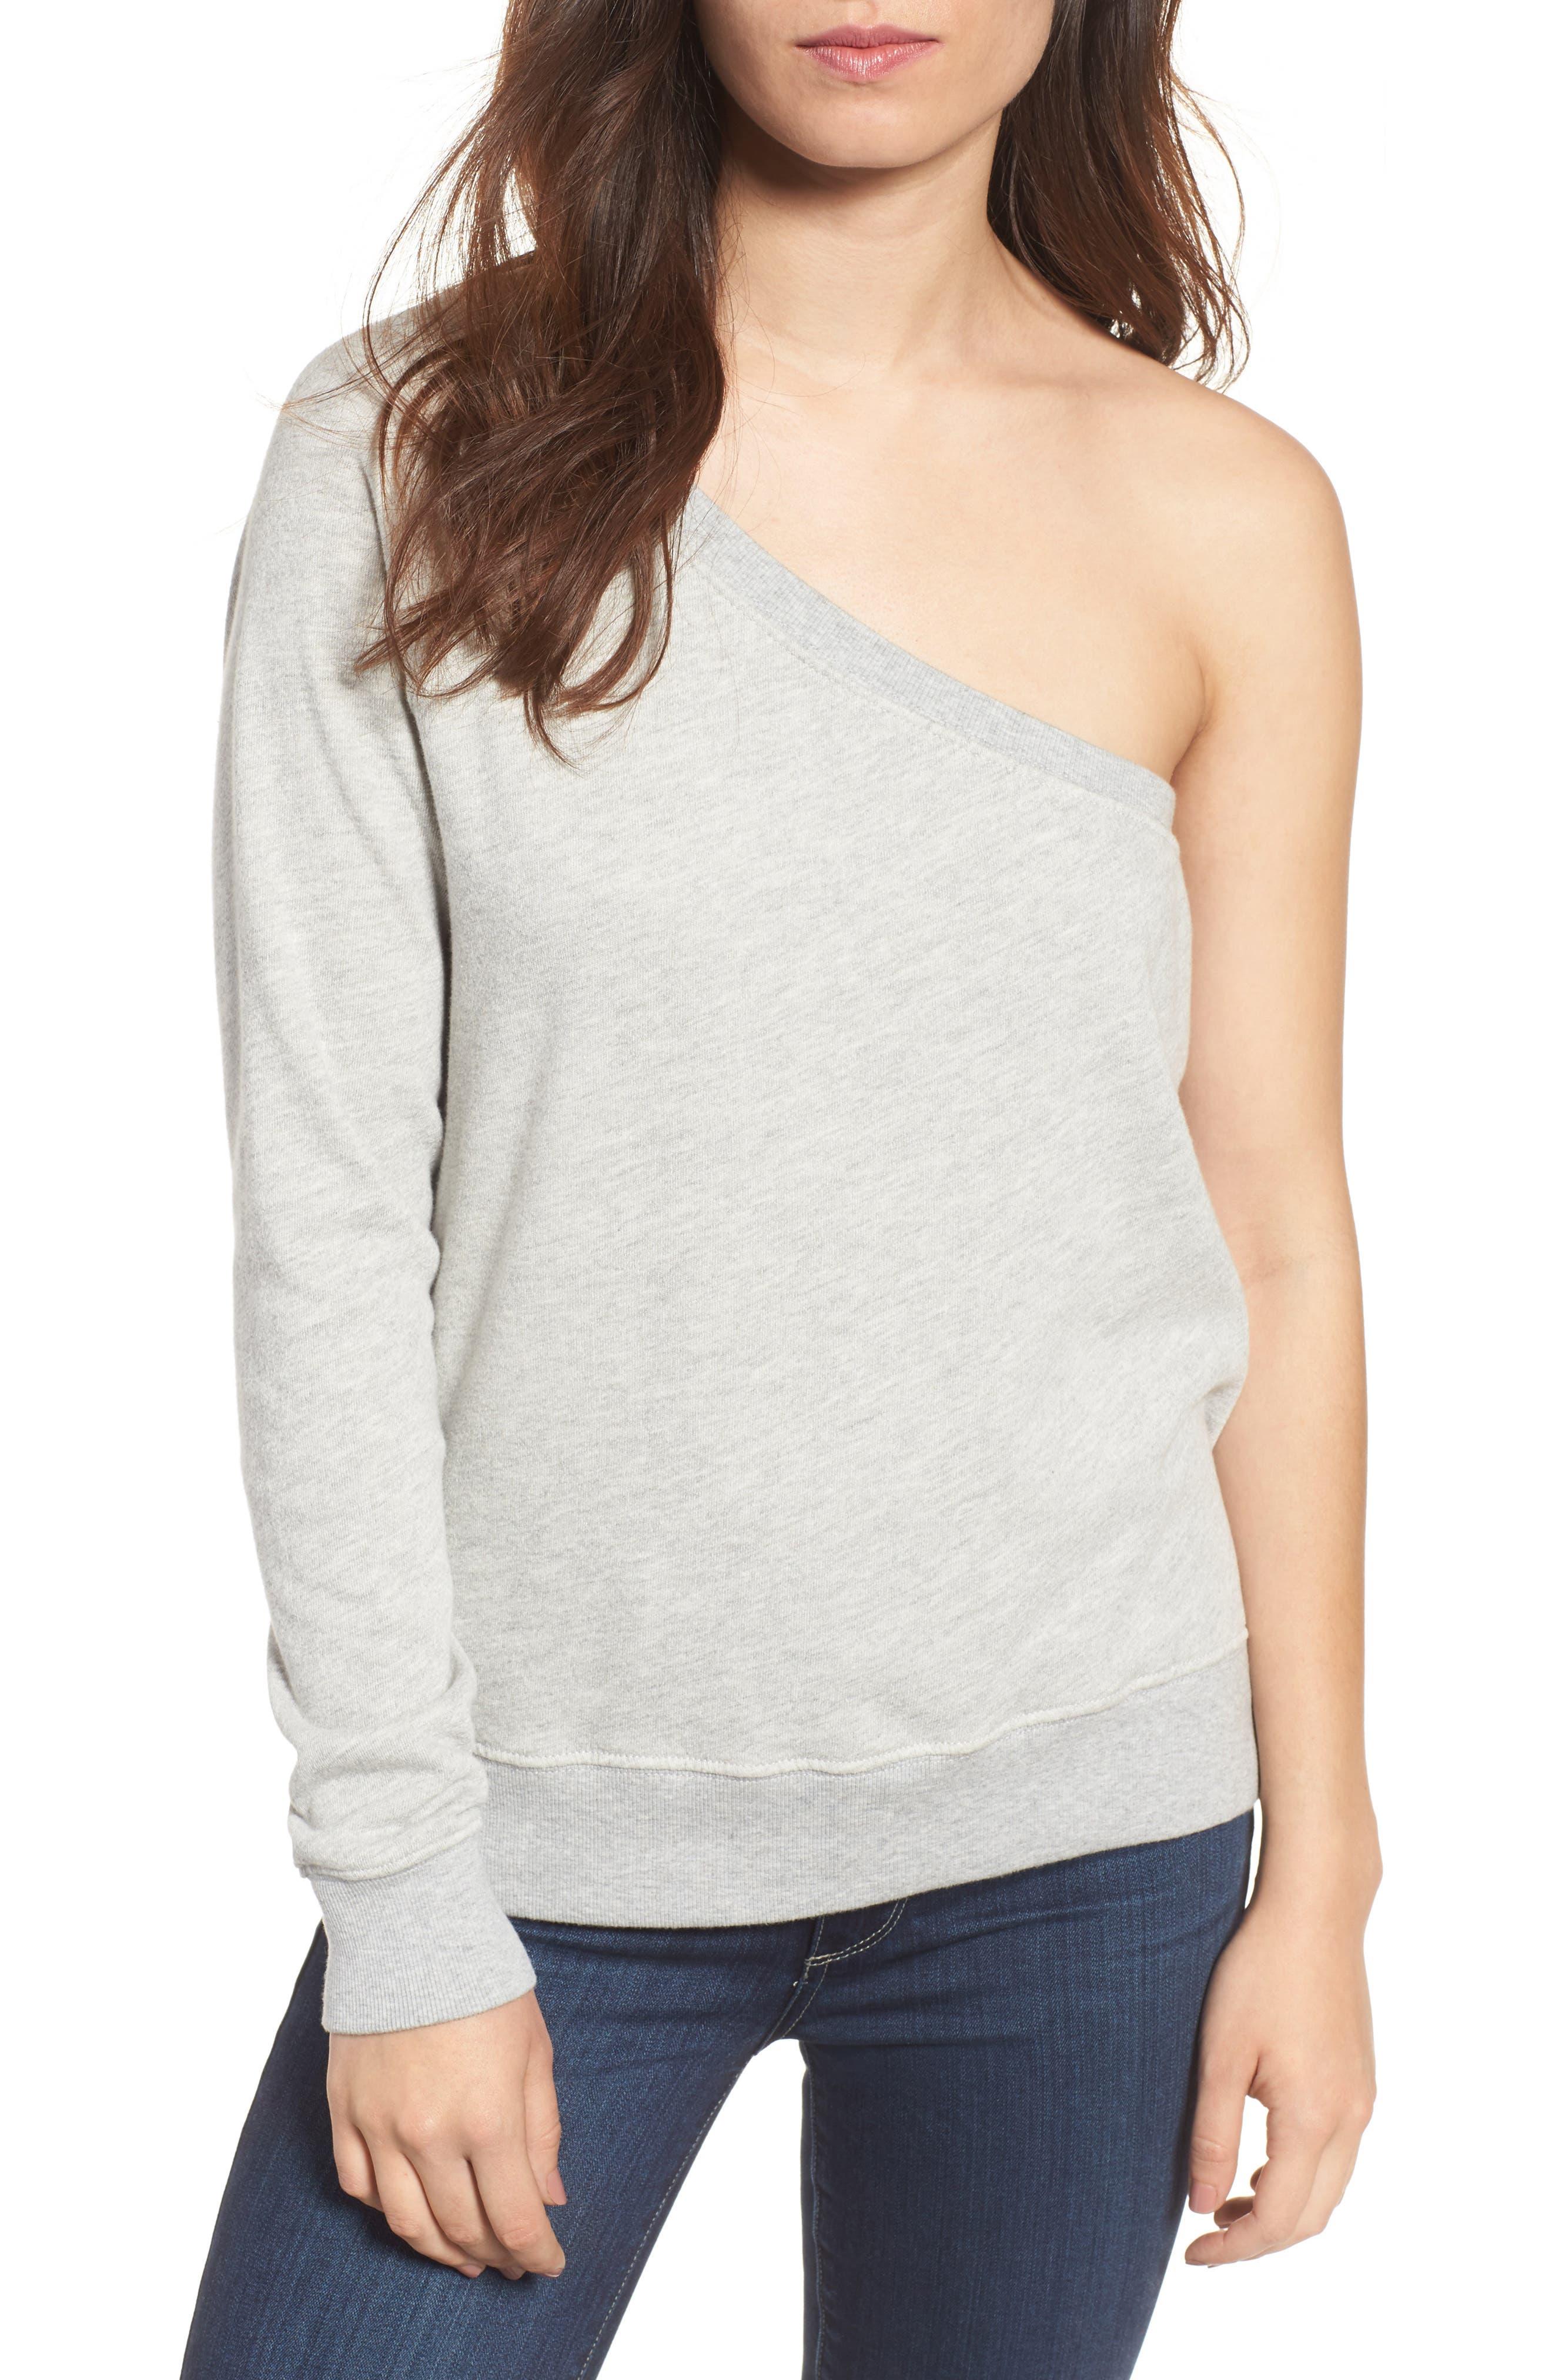 Main Image - Pam & Gela One-Shoulder Sweatshirt